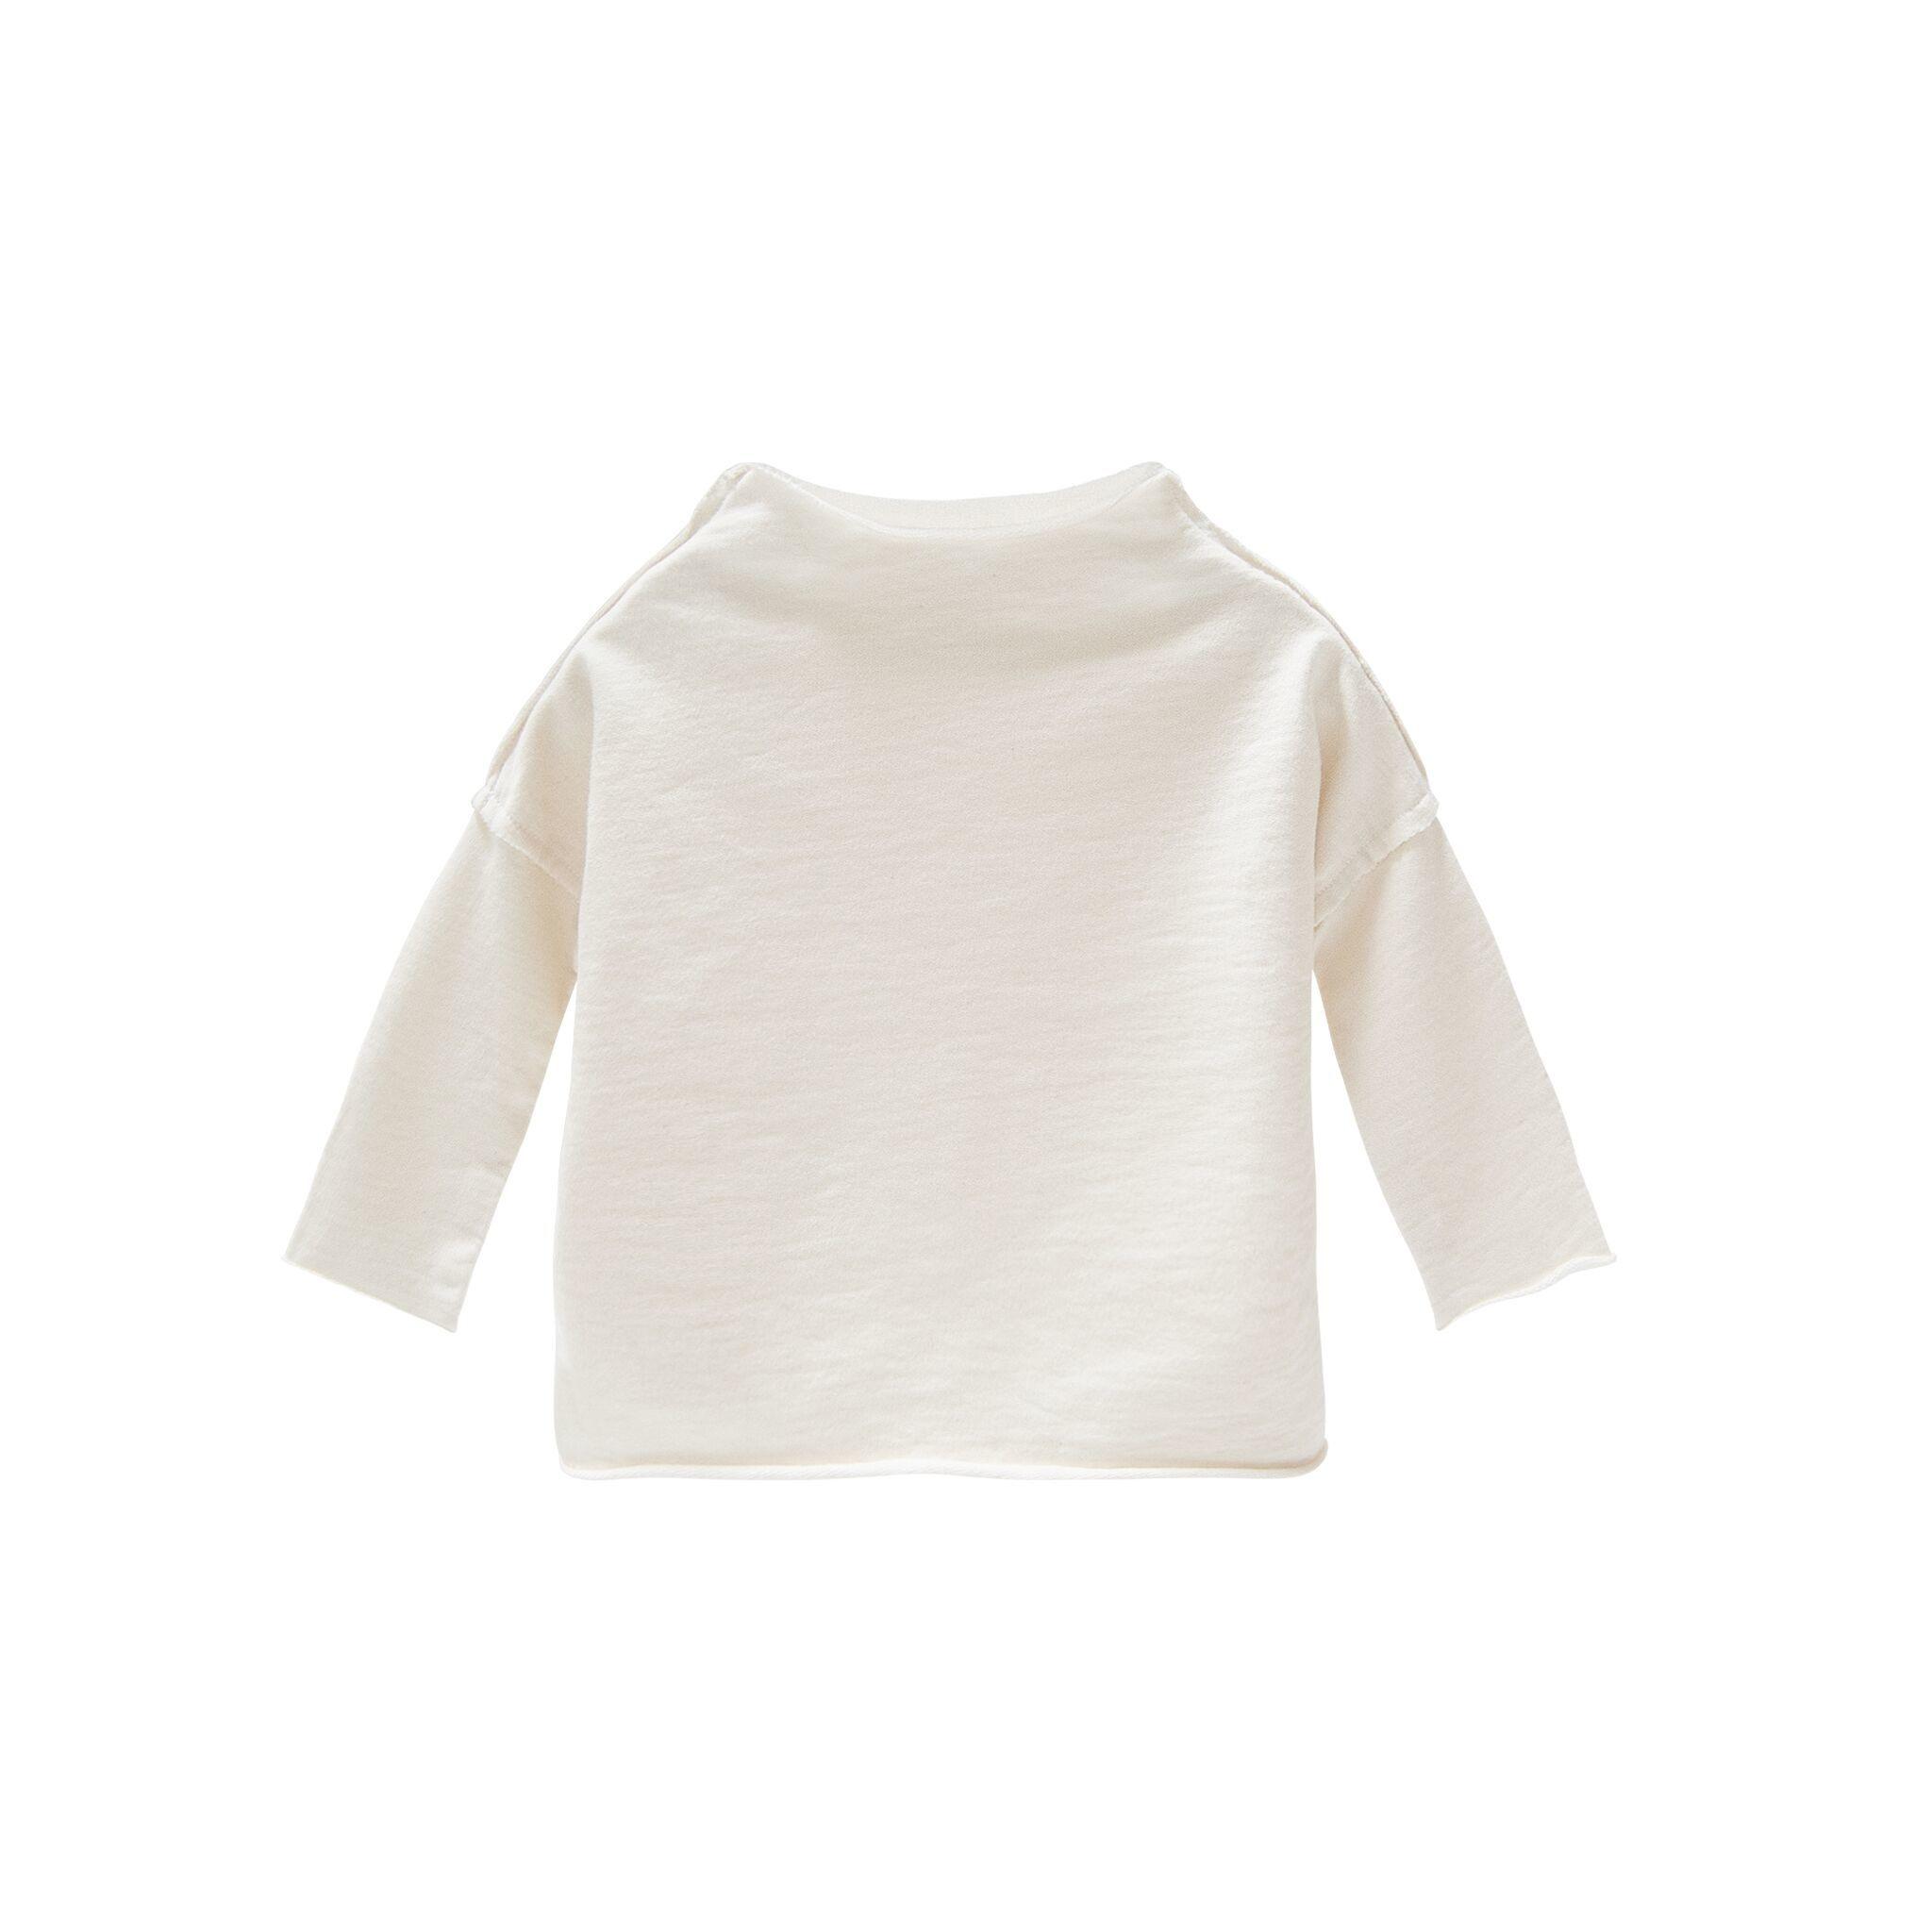 GOGENTLYNATION Pullover Sweatshirt